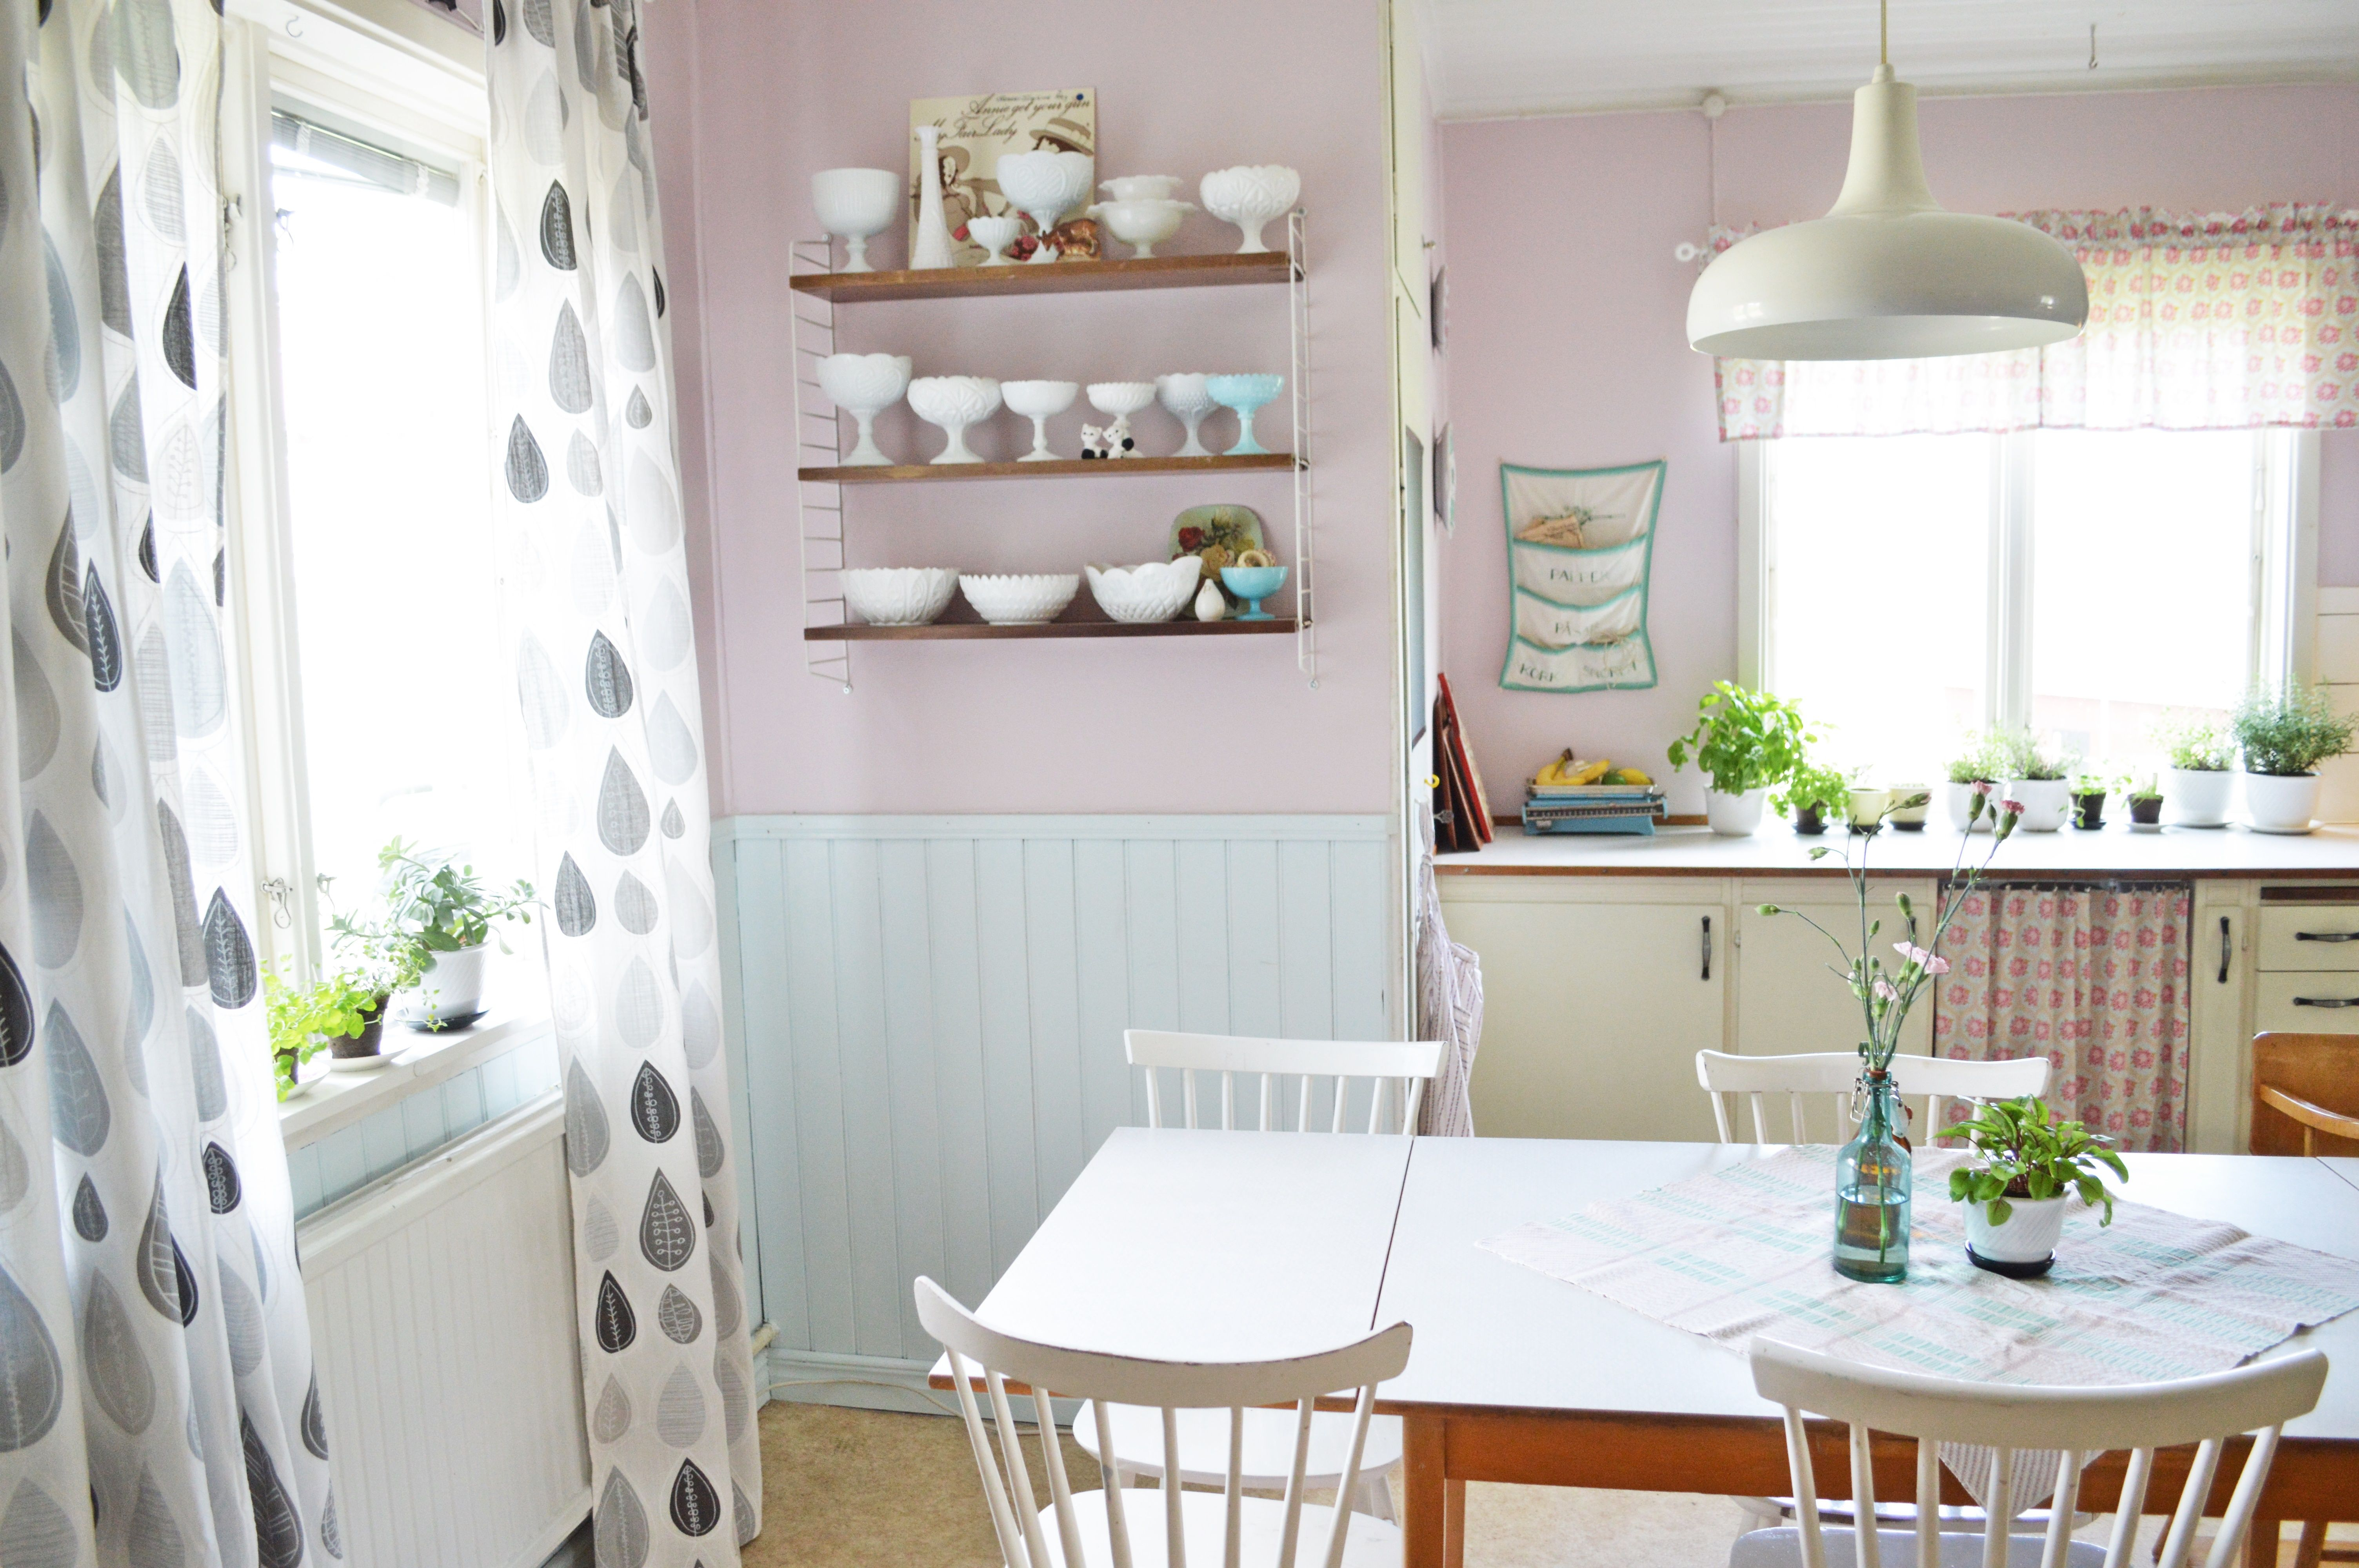 Enchanting Retro Chalkboards For Kitchen Pattern - Kitchen Cabinets ...